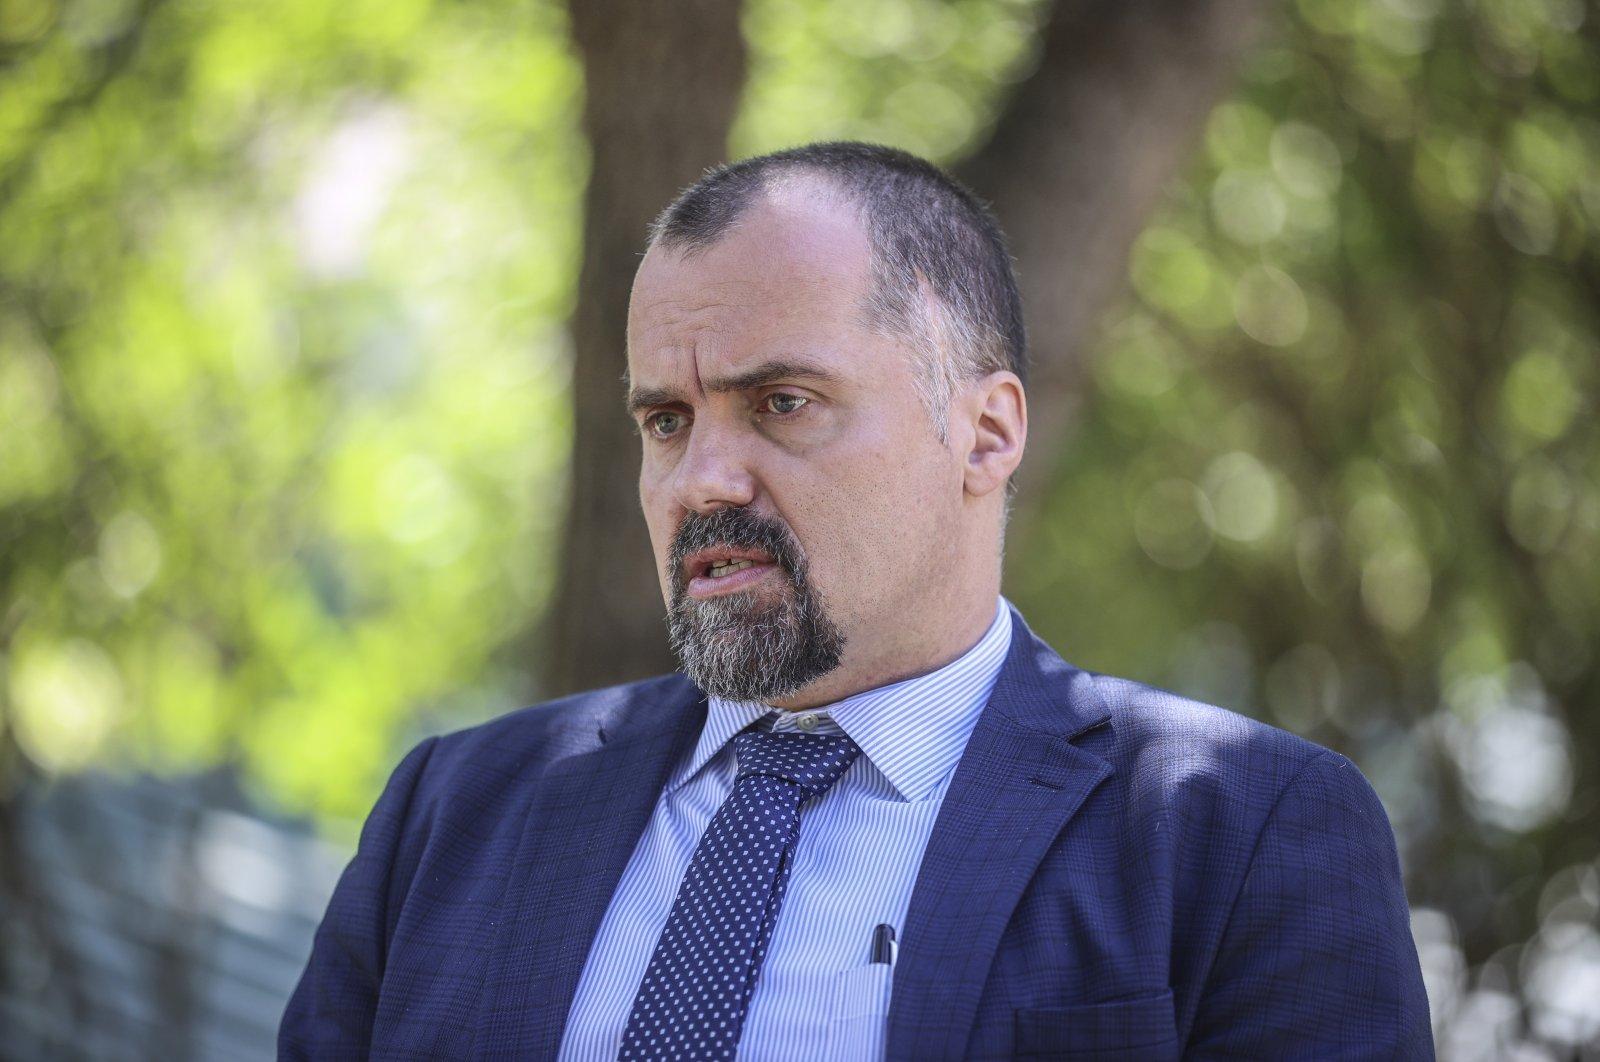 Poland's ambassador to Ankara Jakub Kumoch during an interview with Anadolu Agency in Ankara, Turkey, July 13, 2021. (AA Photo)